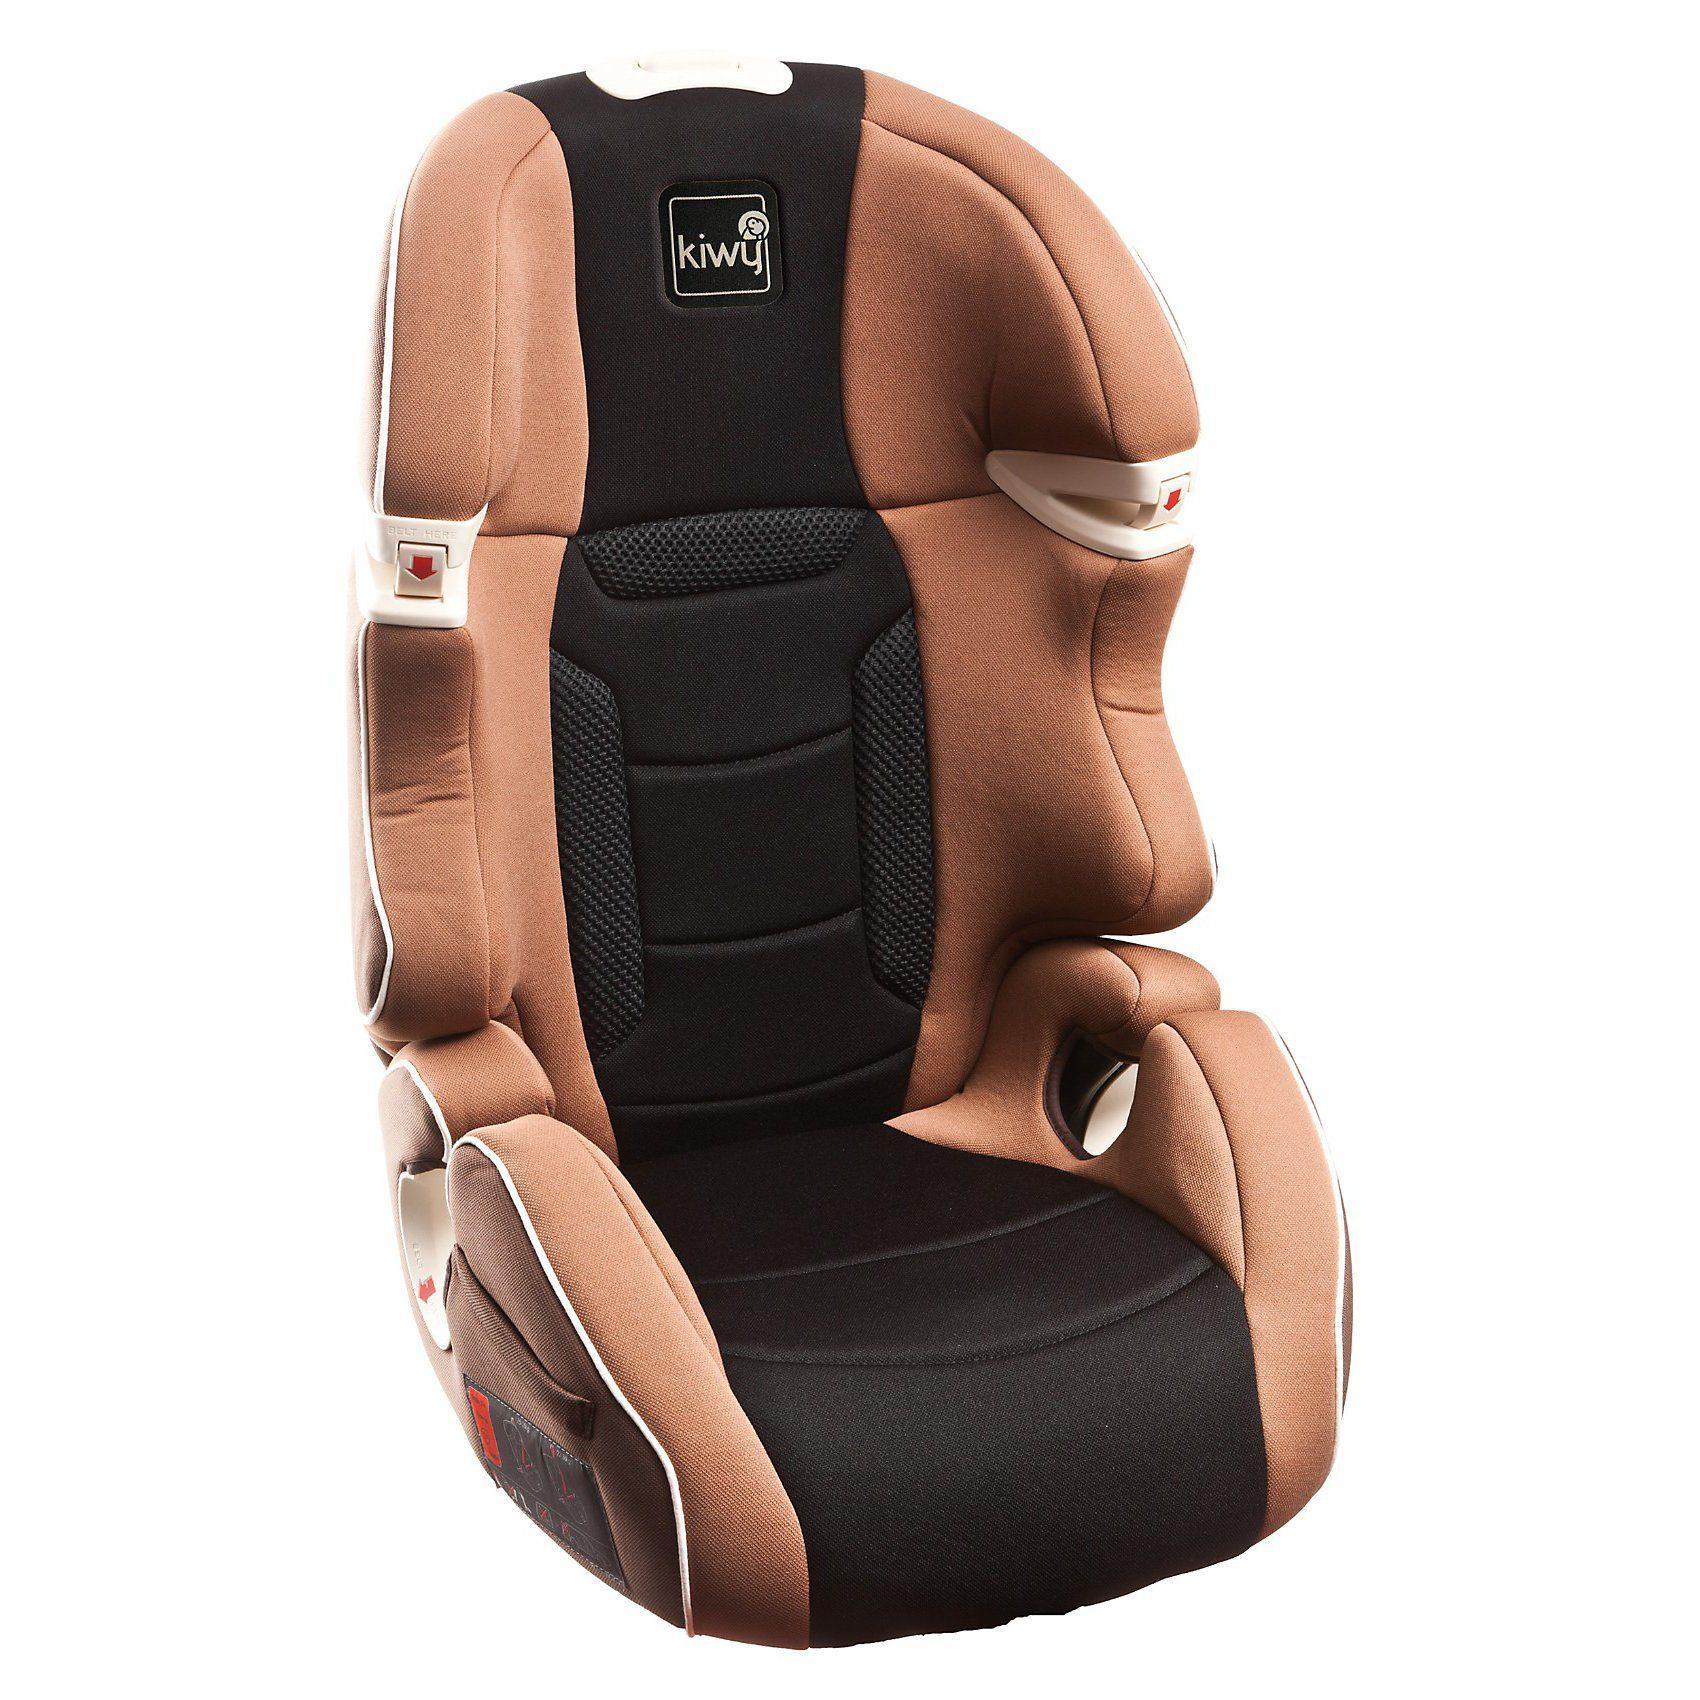 Kiwy Auto-Kindersitz S23, moka, 2016